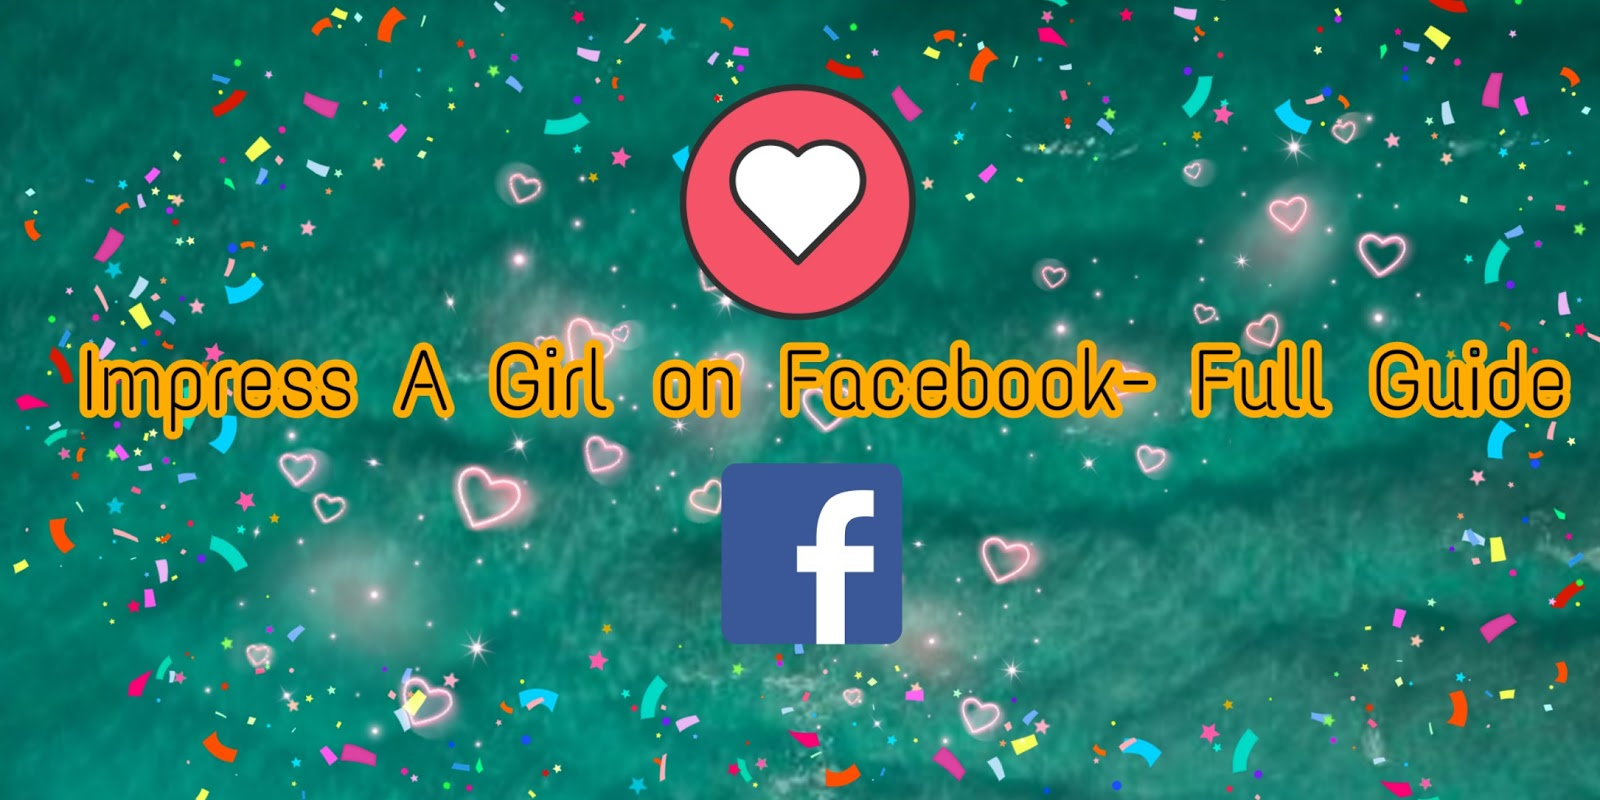 Impress A Girl On Facebook